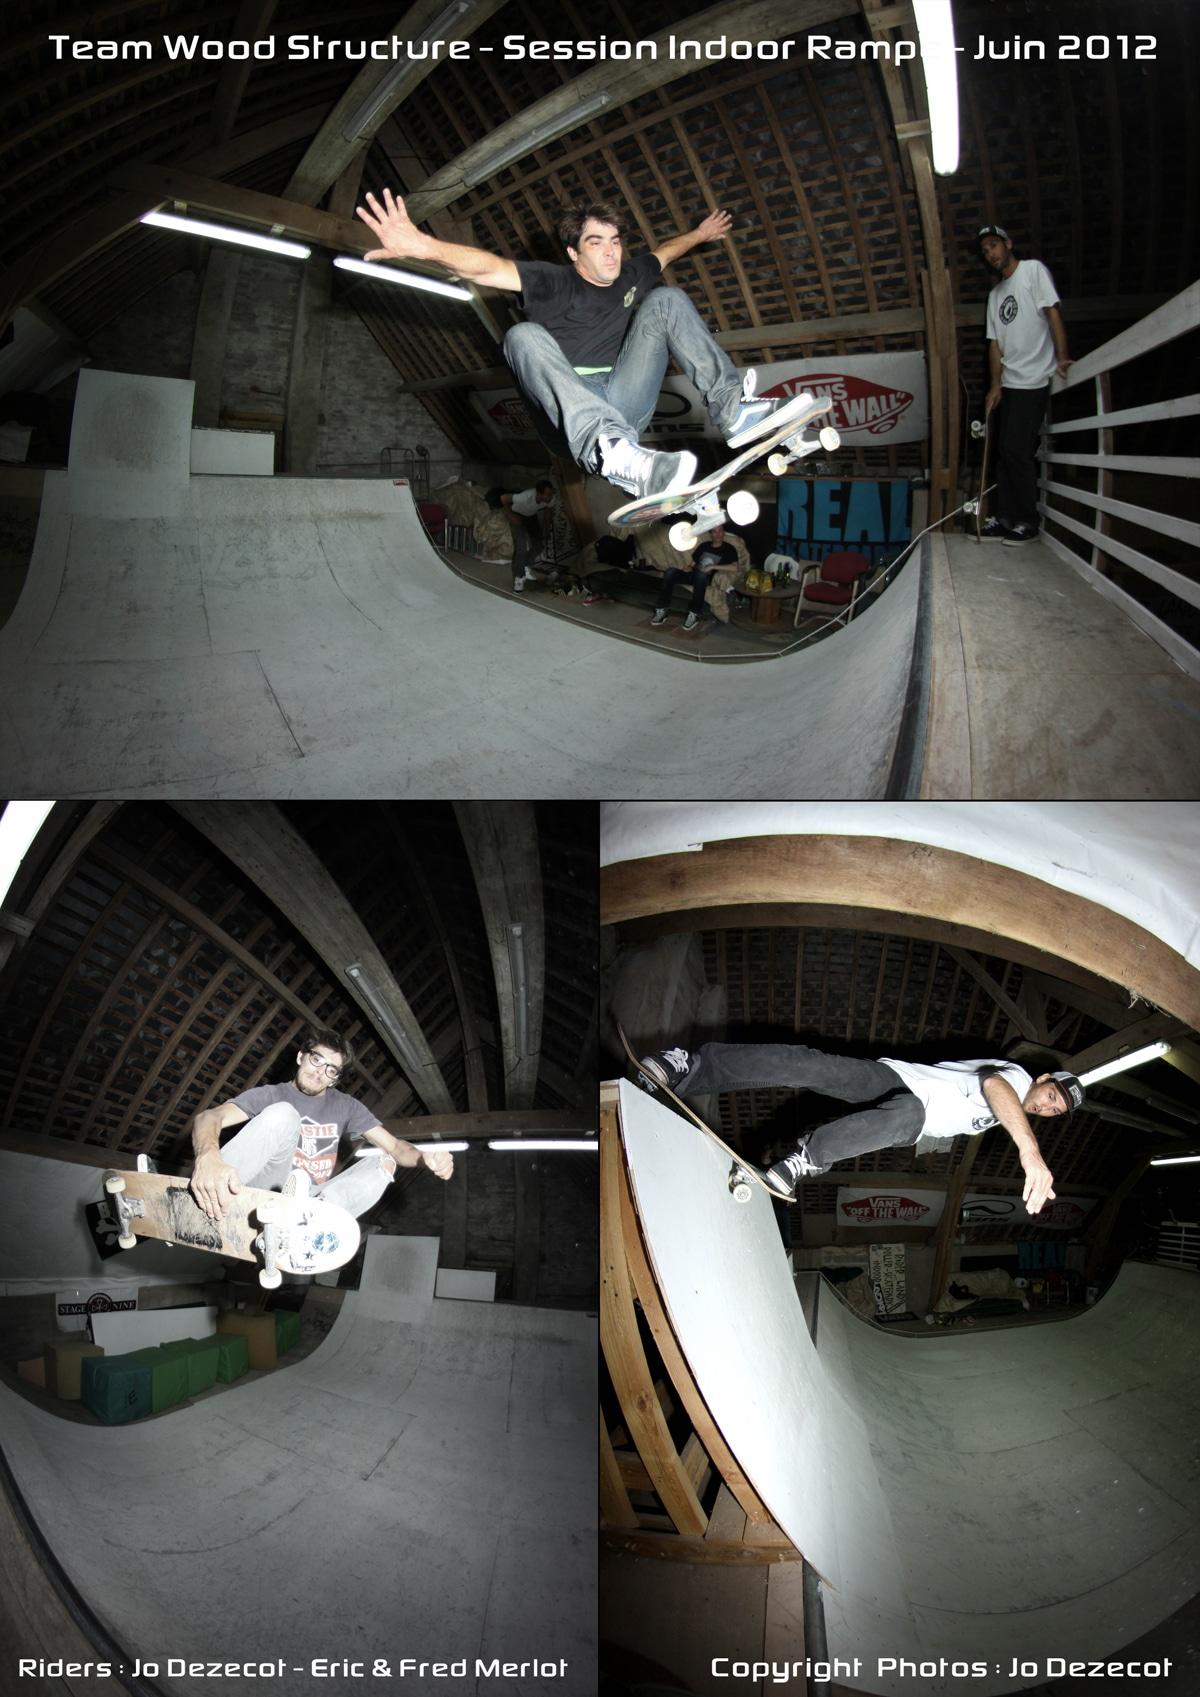 Team Wood Structure Skatepark - Session Indoor Ramp